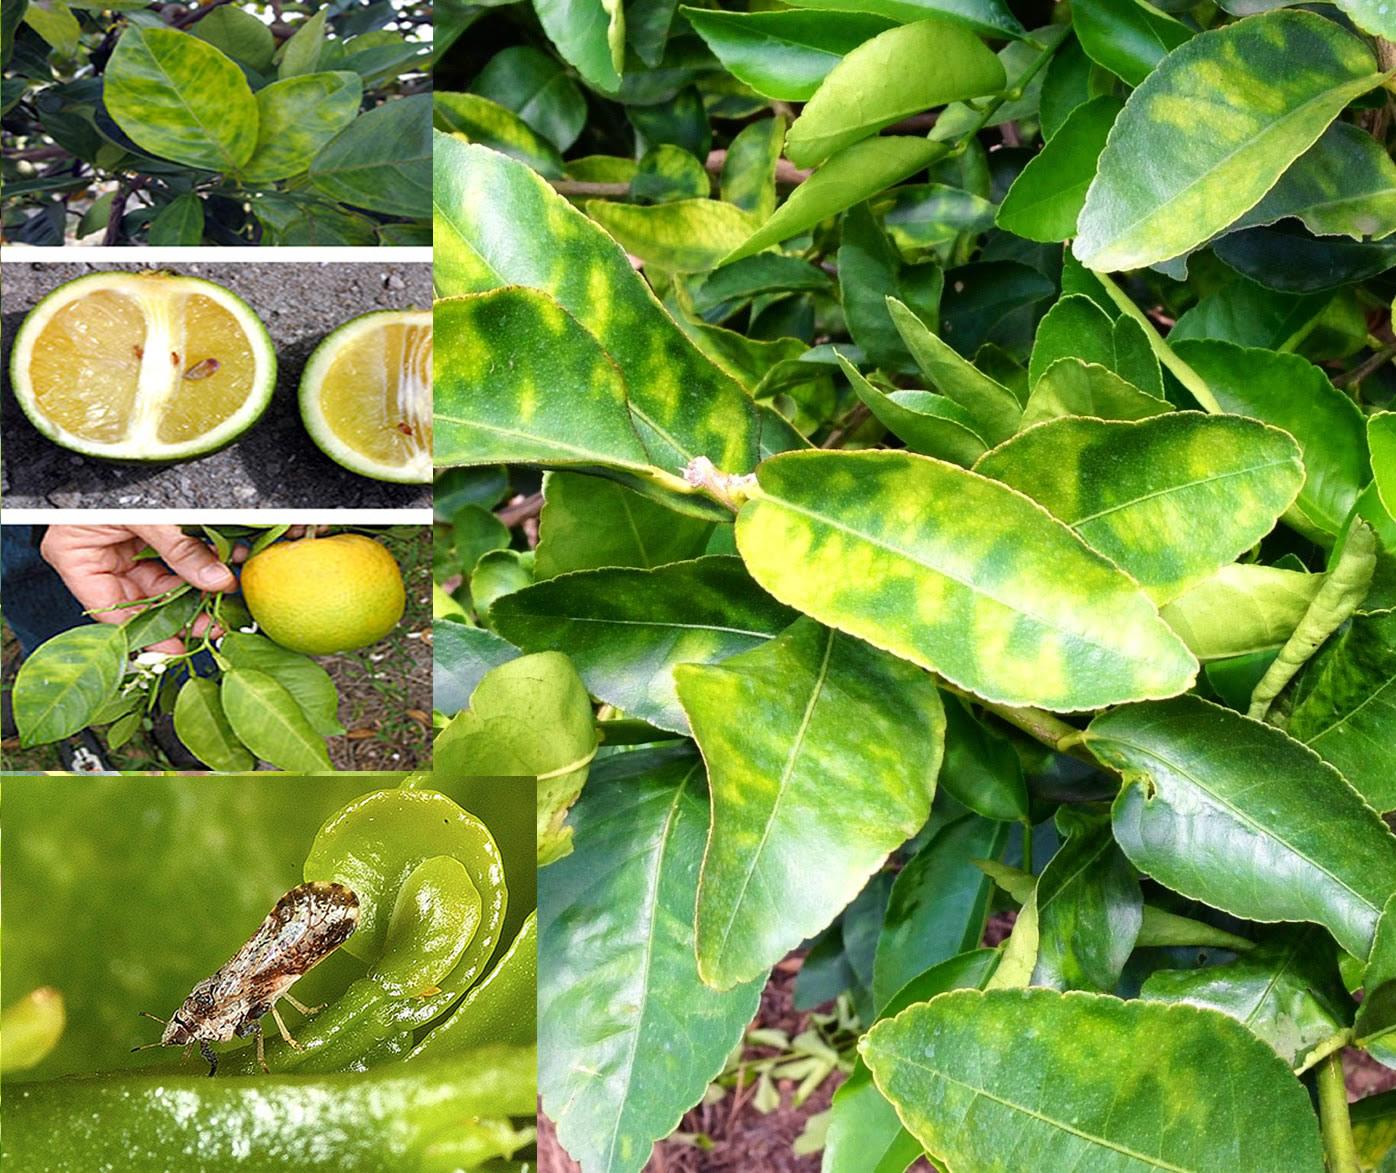 Agrumes le greening la maladie qui a d vast des millions d hectares hortitecnews - La mineuse des agrumes ...